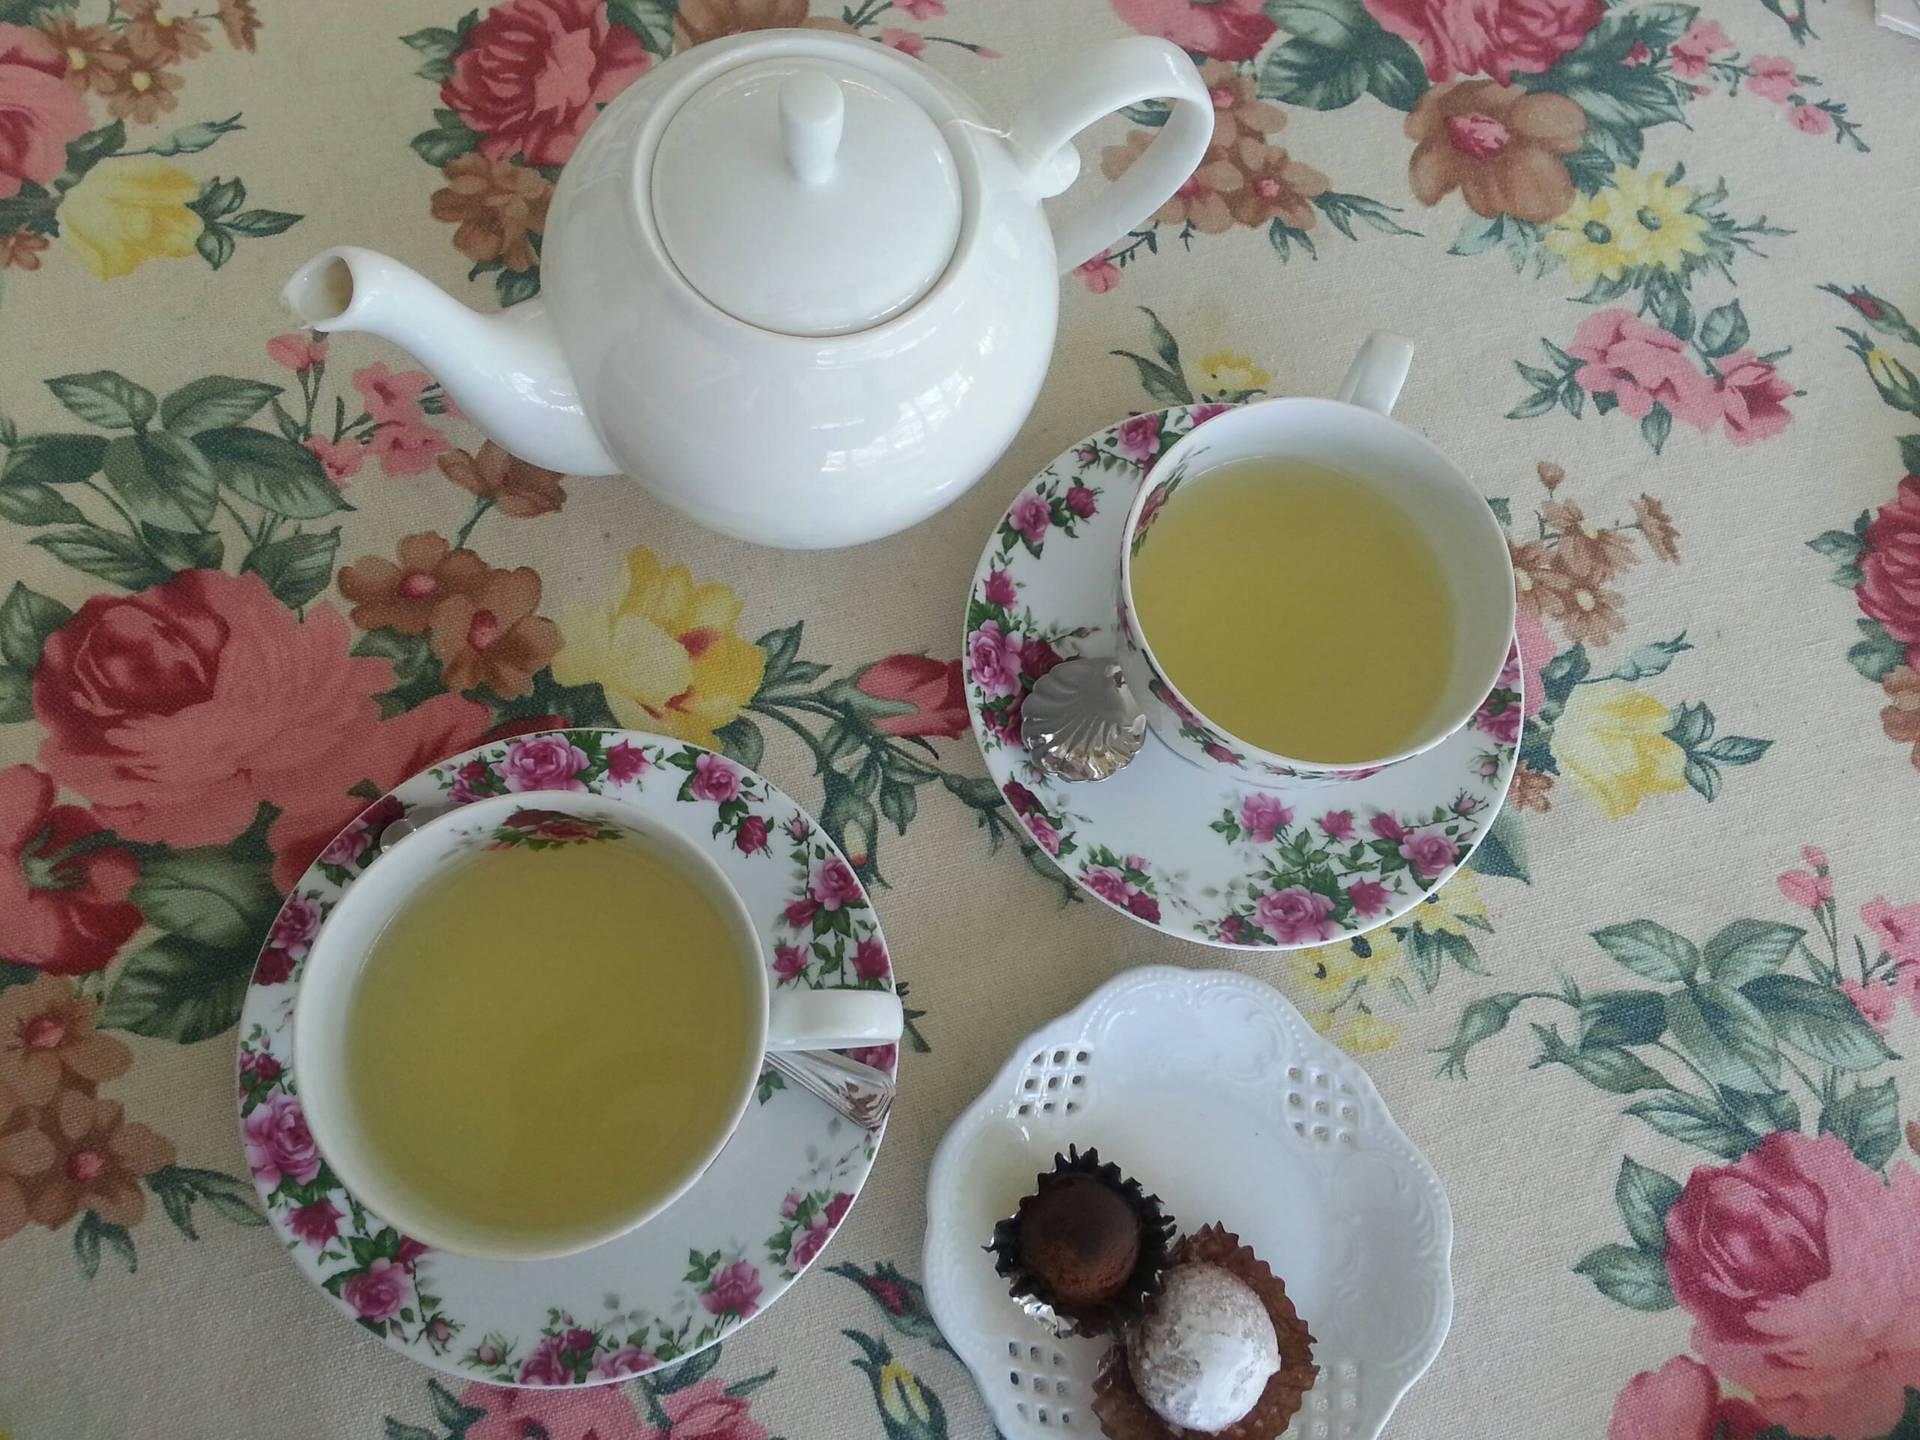 Camomile Tea • สวยงาม ที่ ร้านอาหาร Home Fresh Hydrofarm